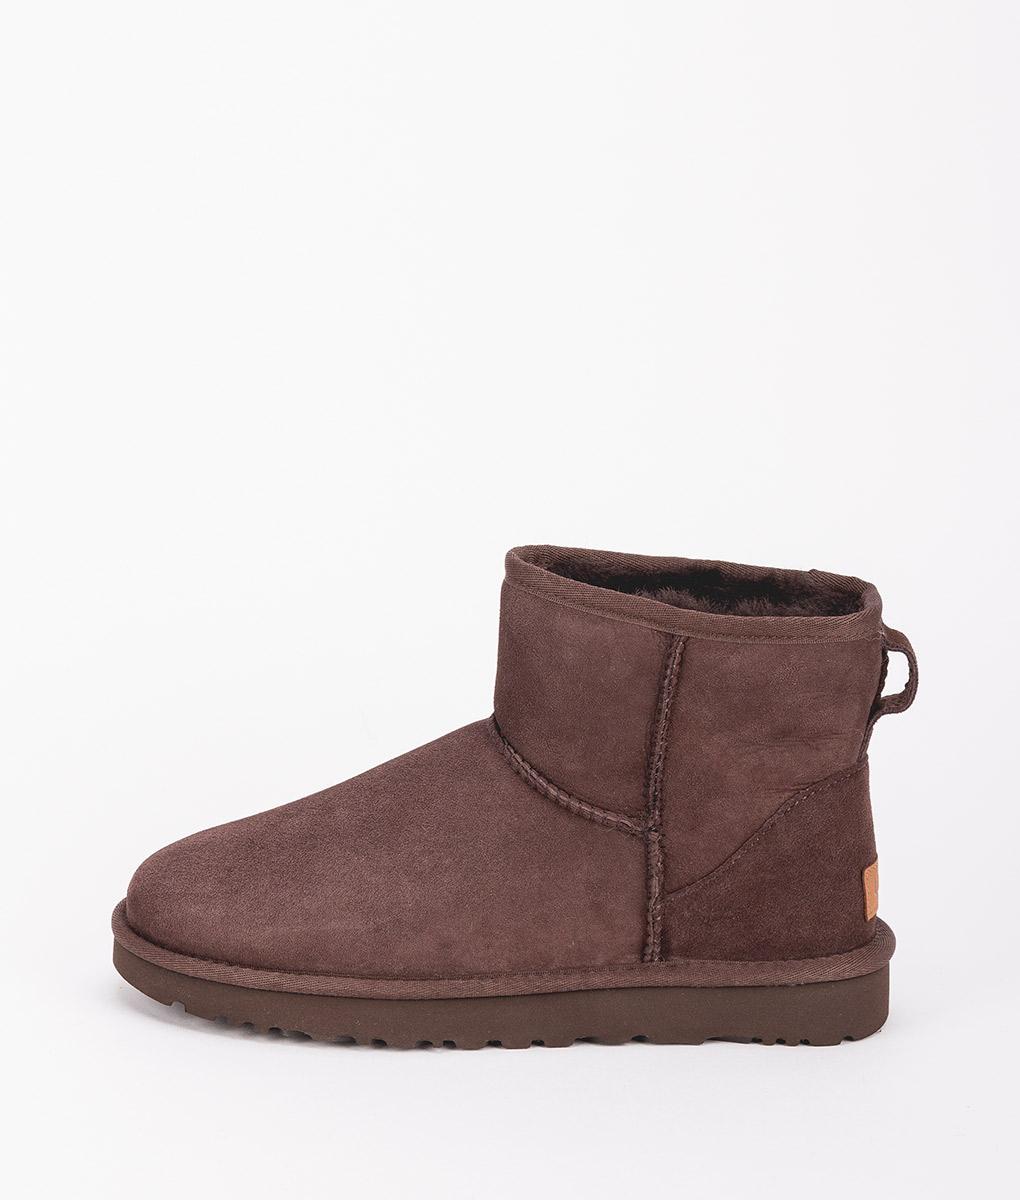 UGG Women Ankle Boots 1016222 CLASSIC MINI II, Chocolate